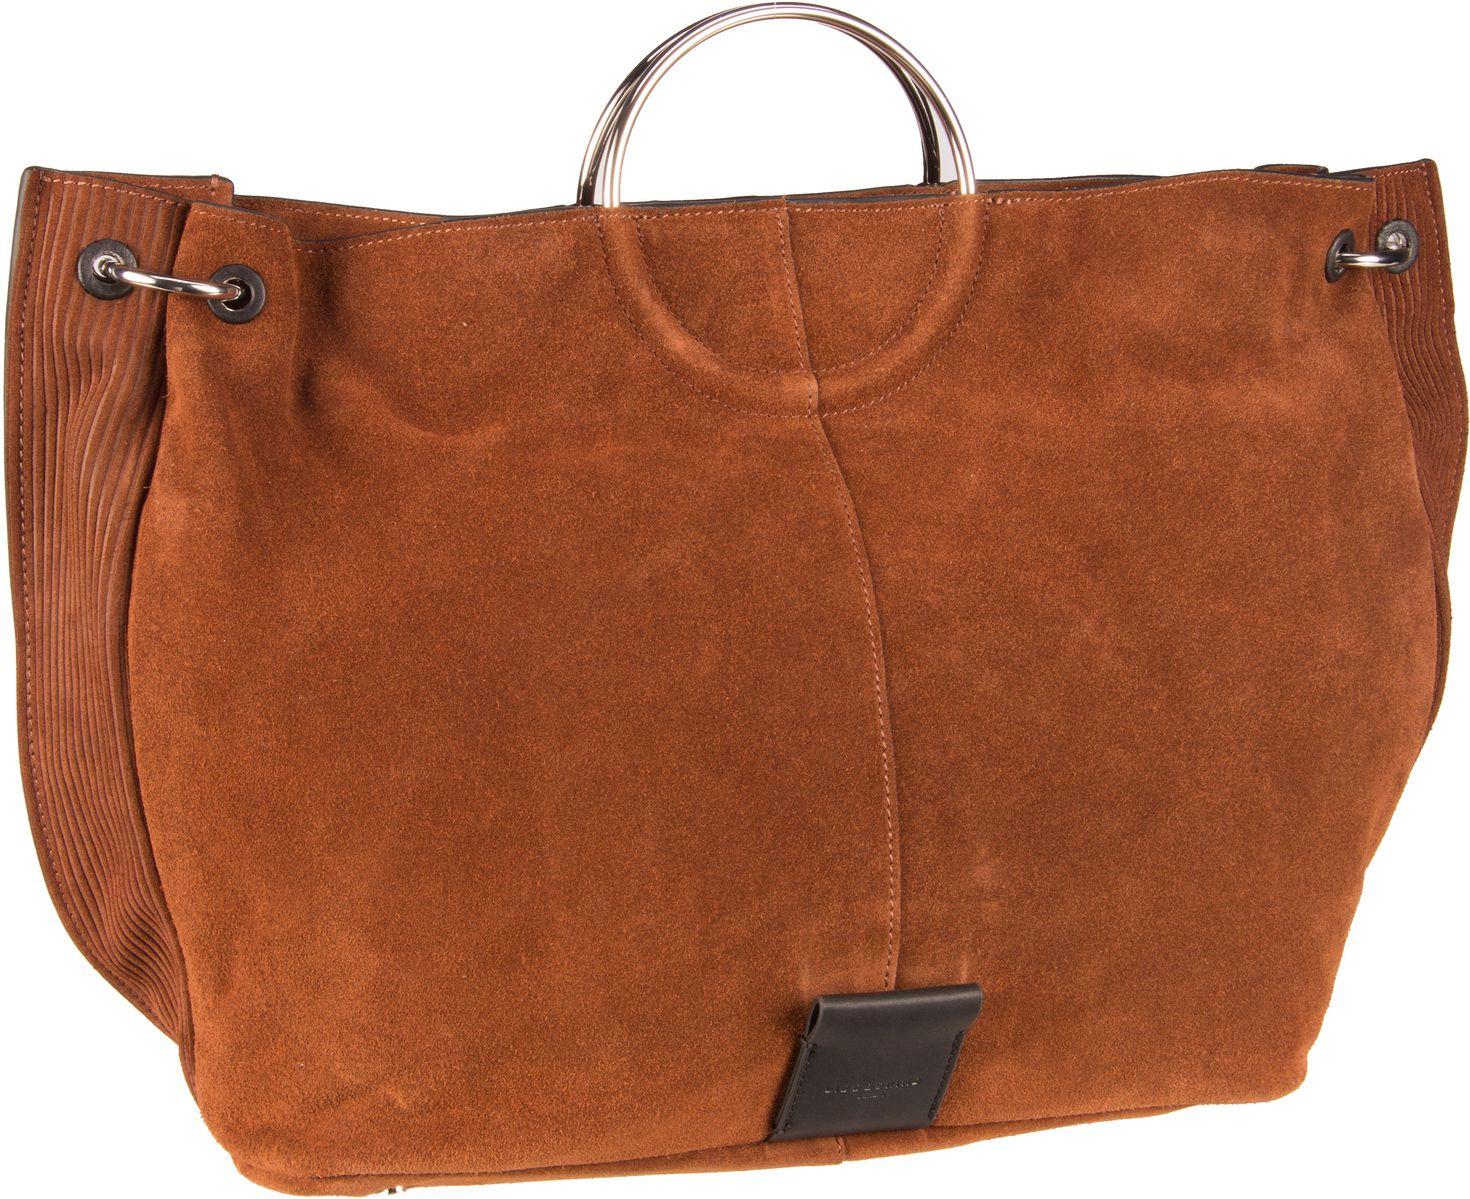 Berlin Handtasche Neo Amalfi Genova Shopper L Suede Toffee